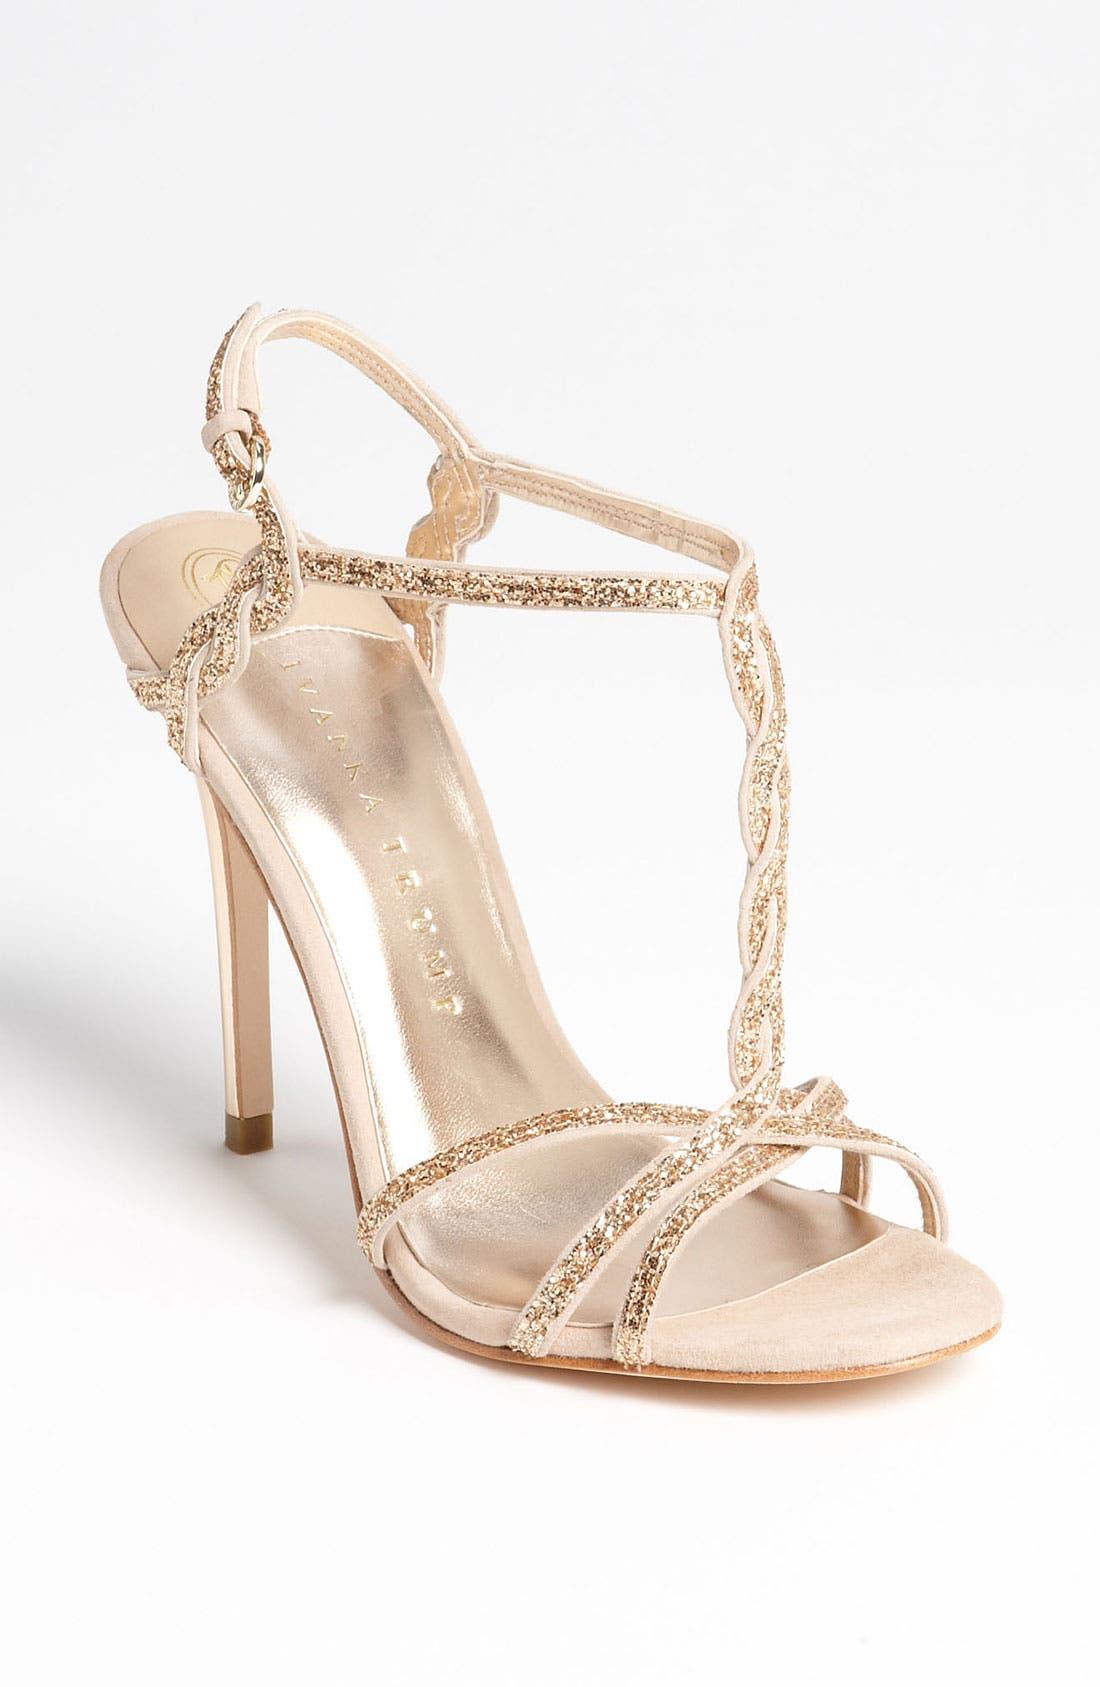 Alternate Image 1 Selected - Ivanka Trump 'Hara' Sandal